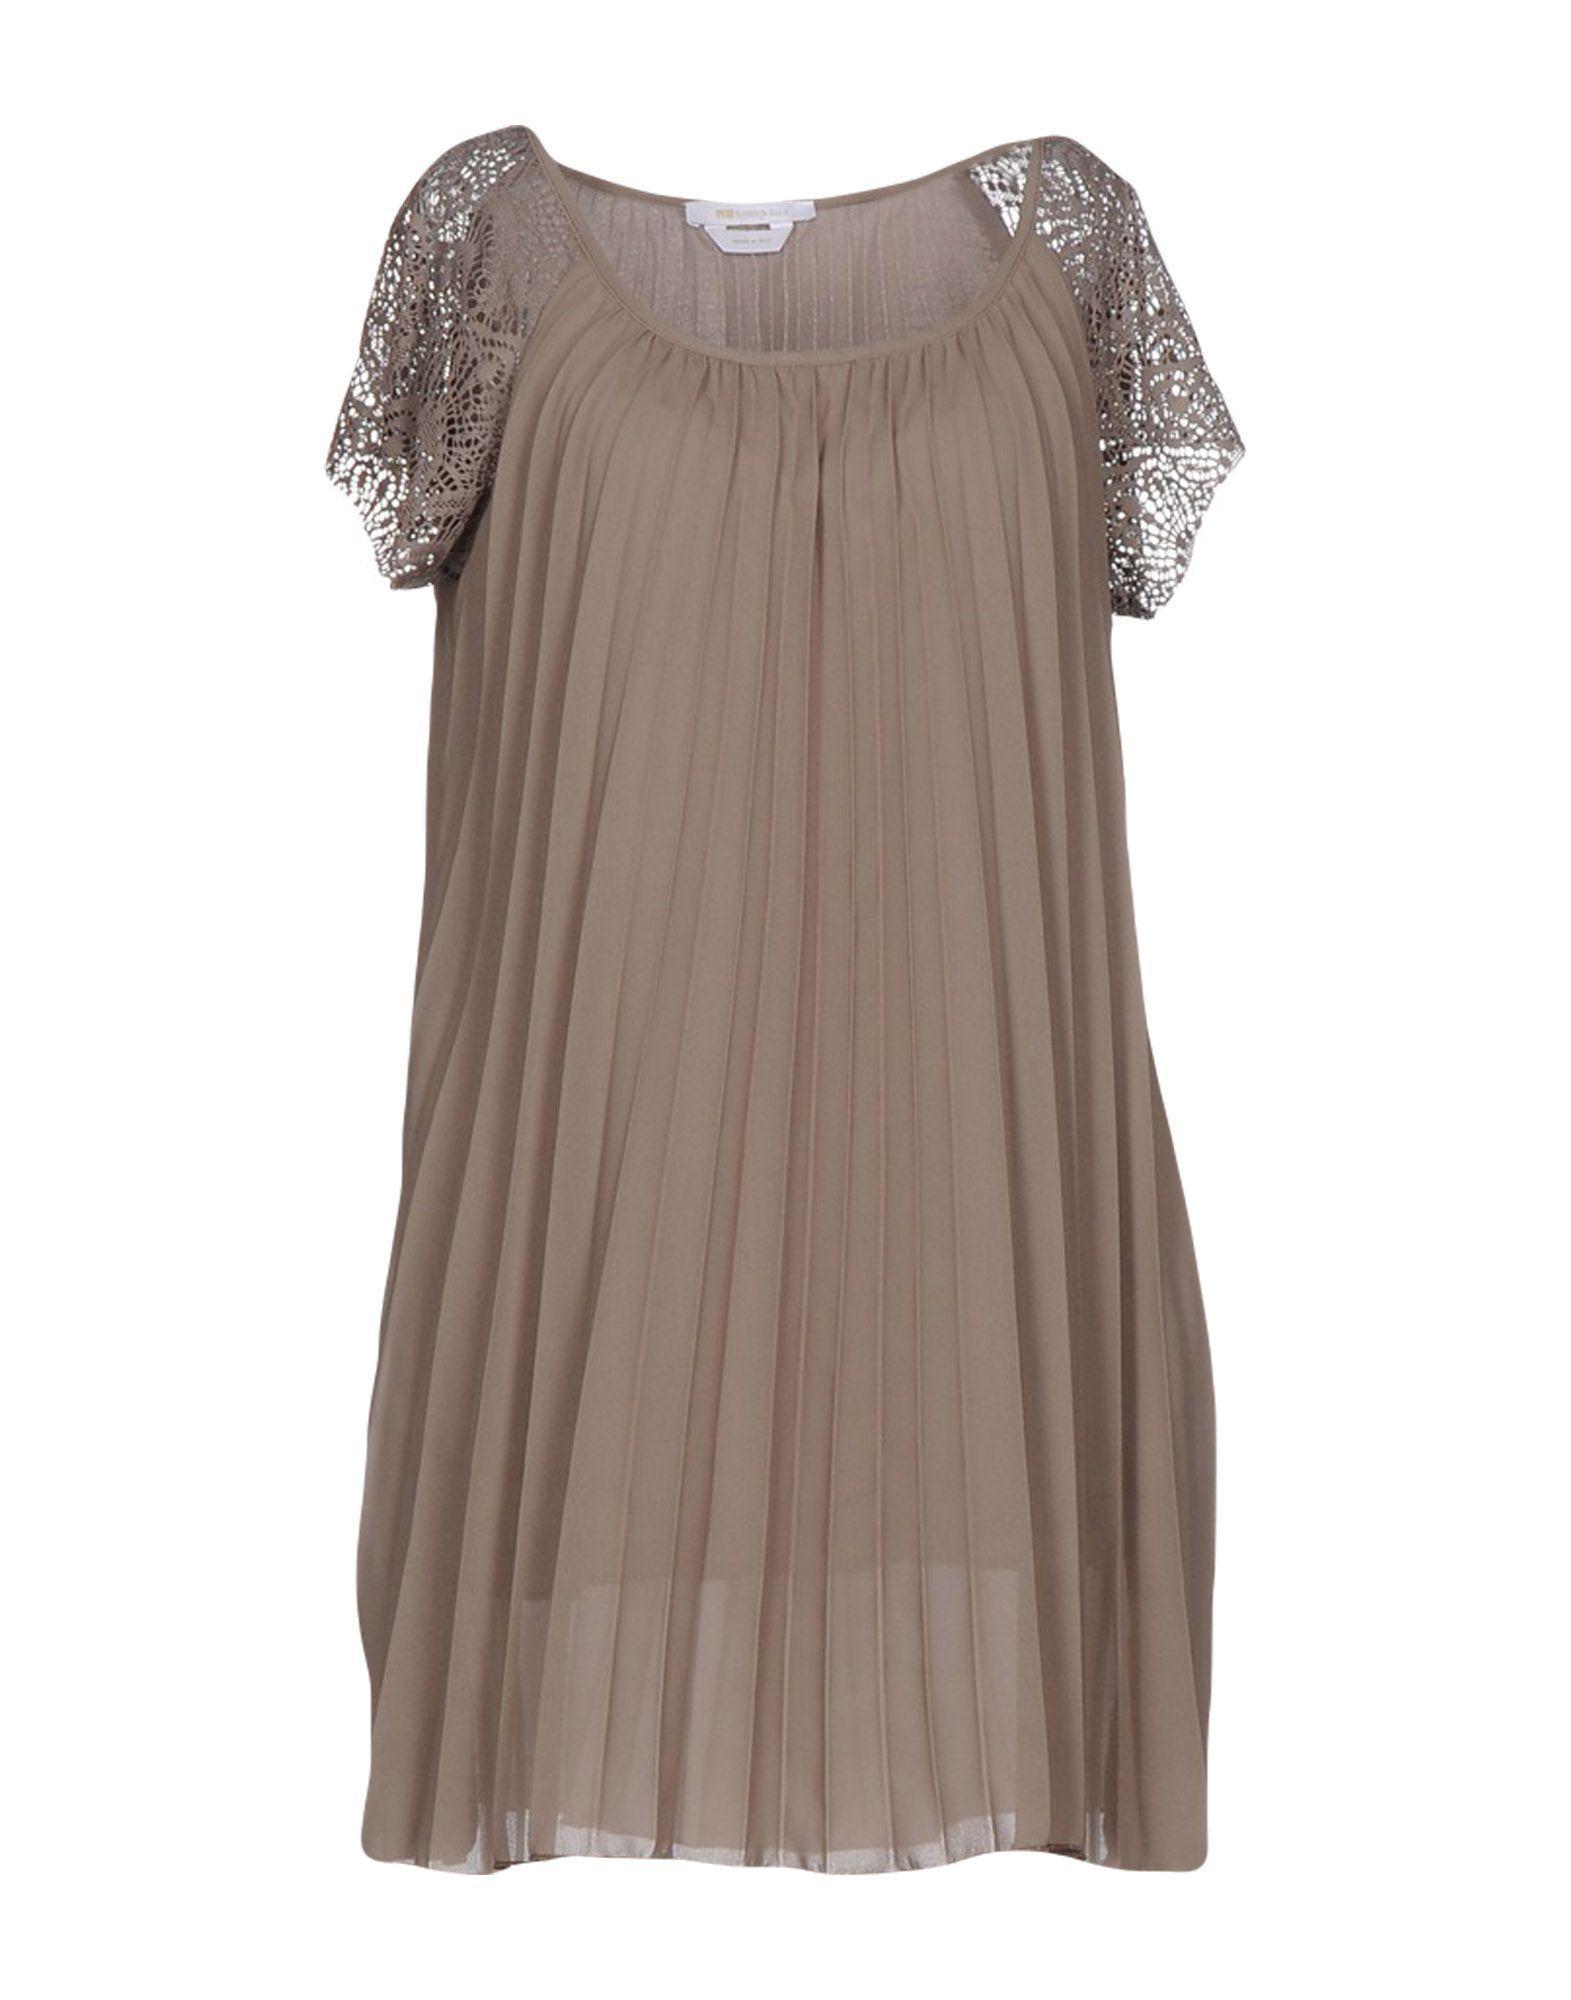 DRESSES Roberta Biagi Khaki Woman Polyester